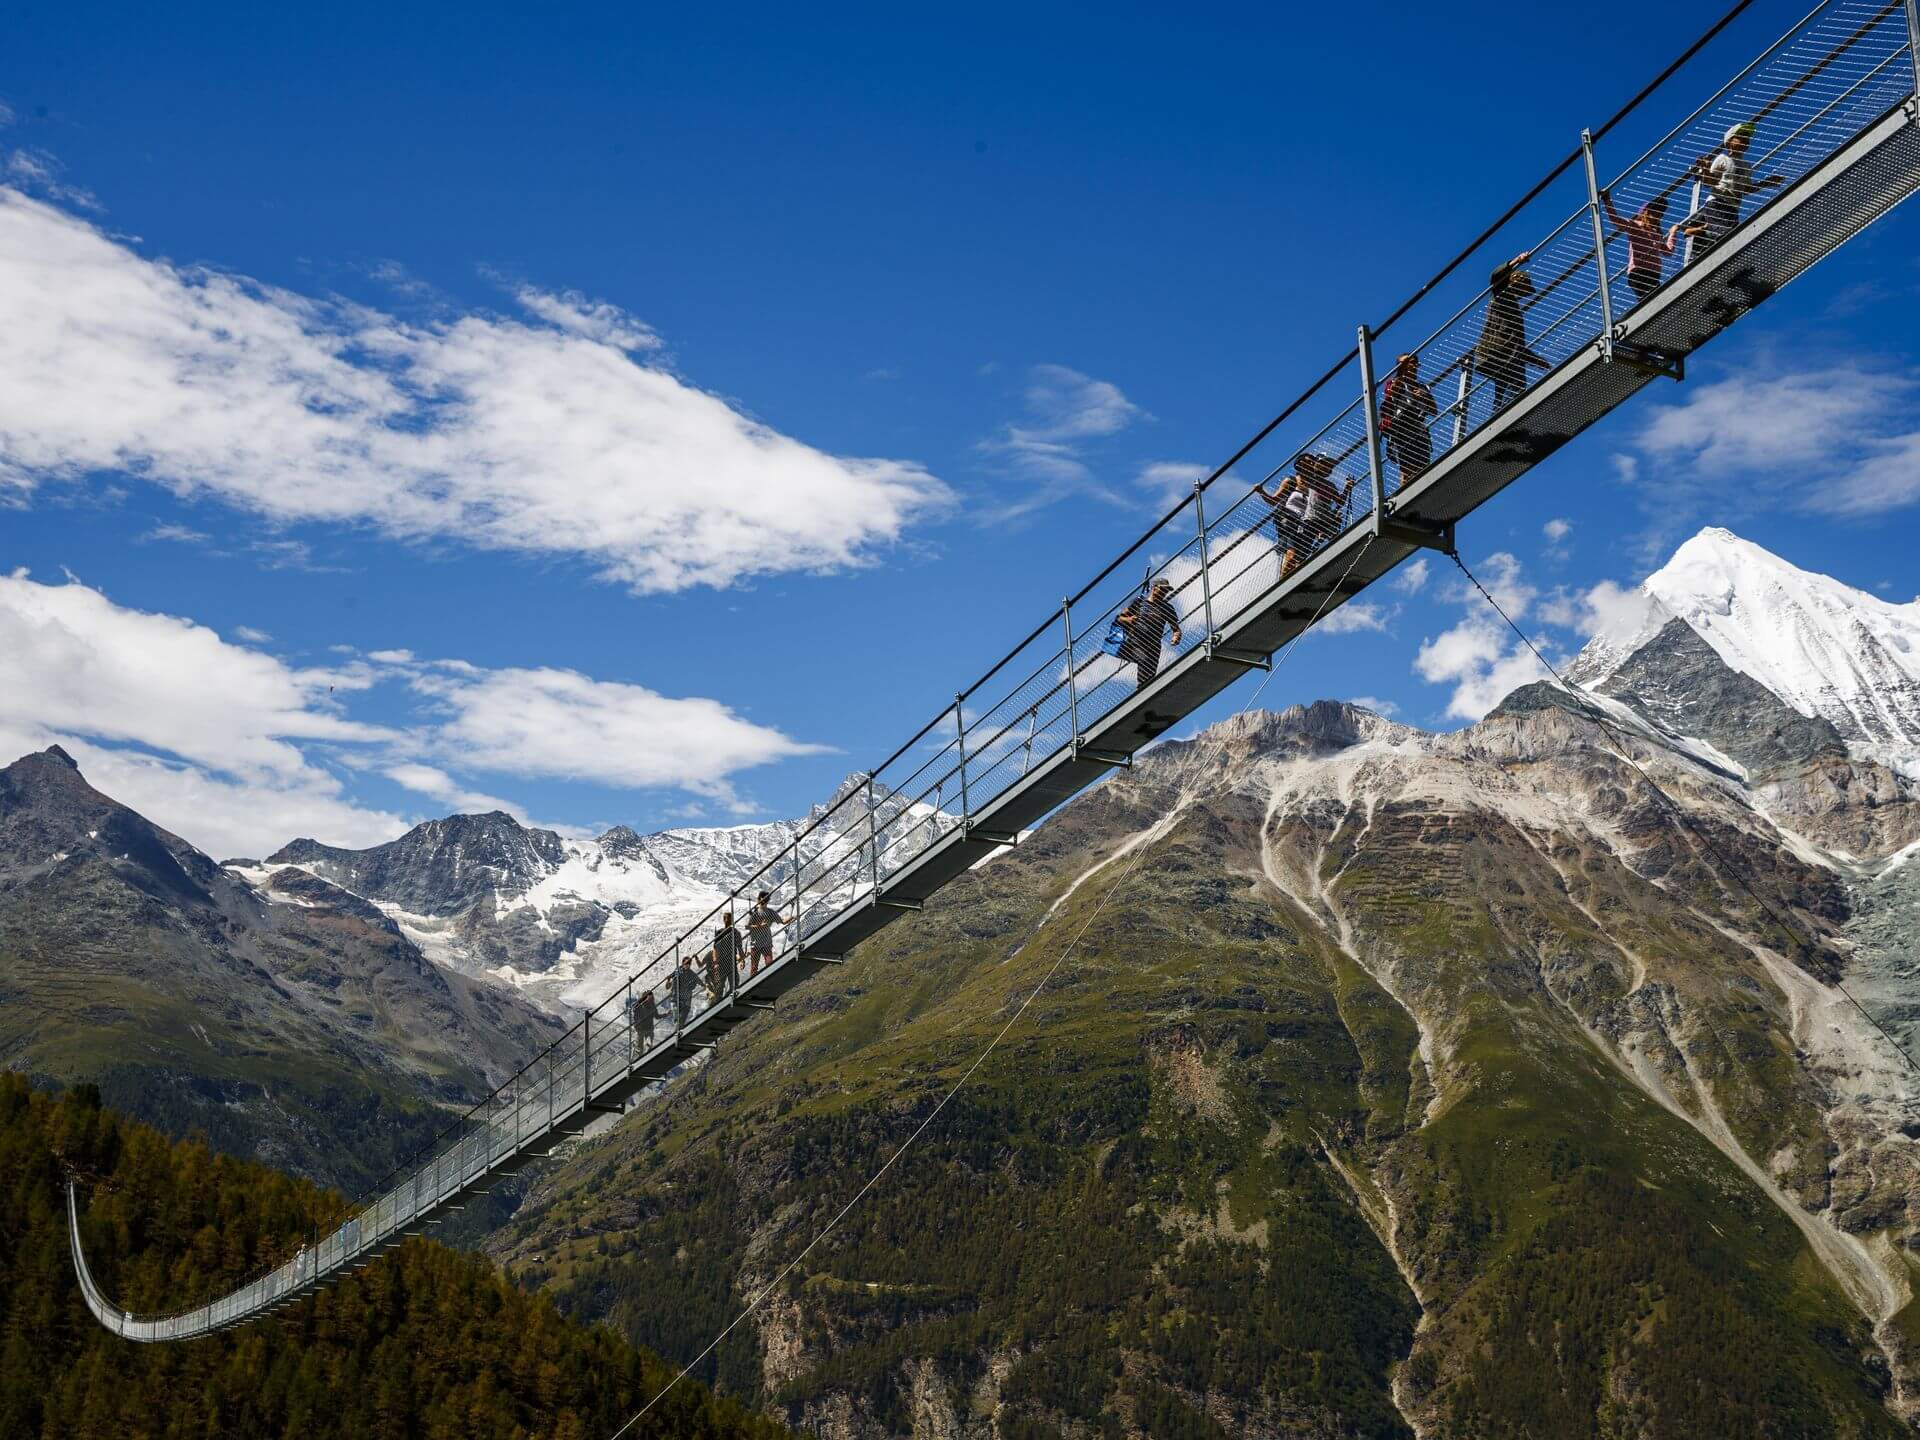 jembatan pejalan kaki terpanjang di dunia